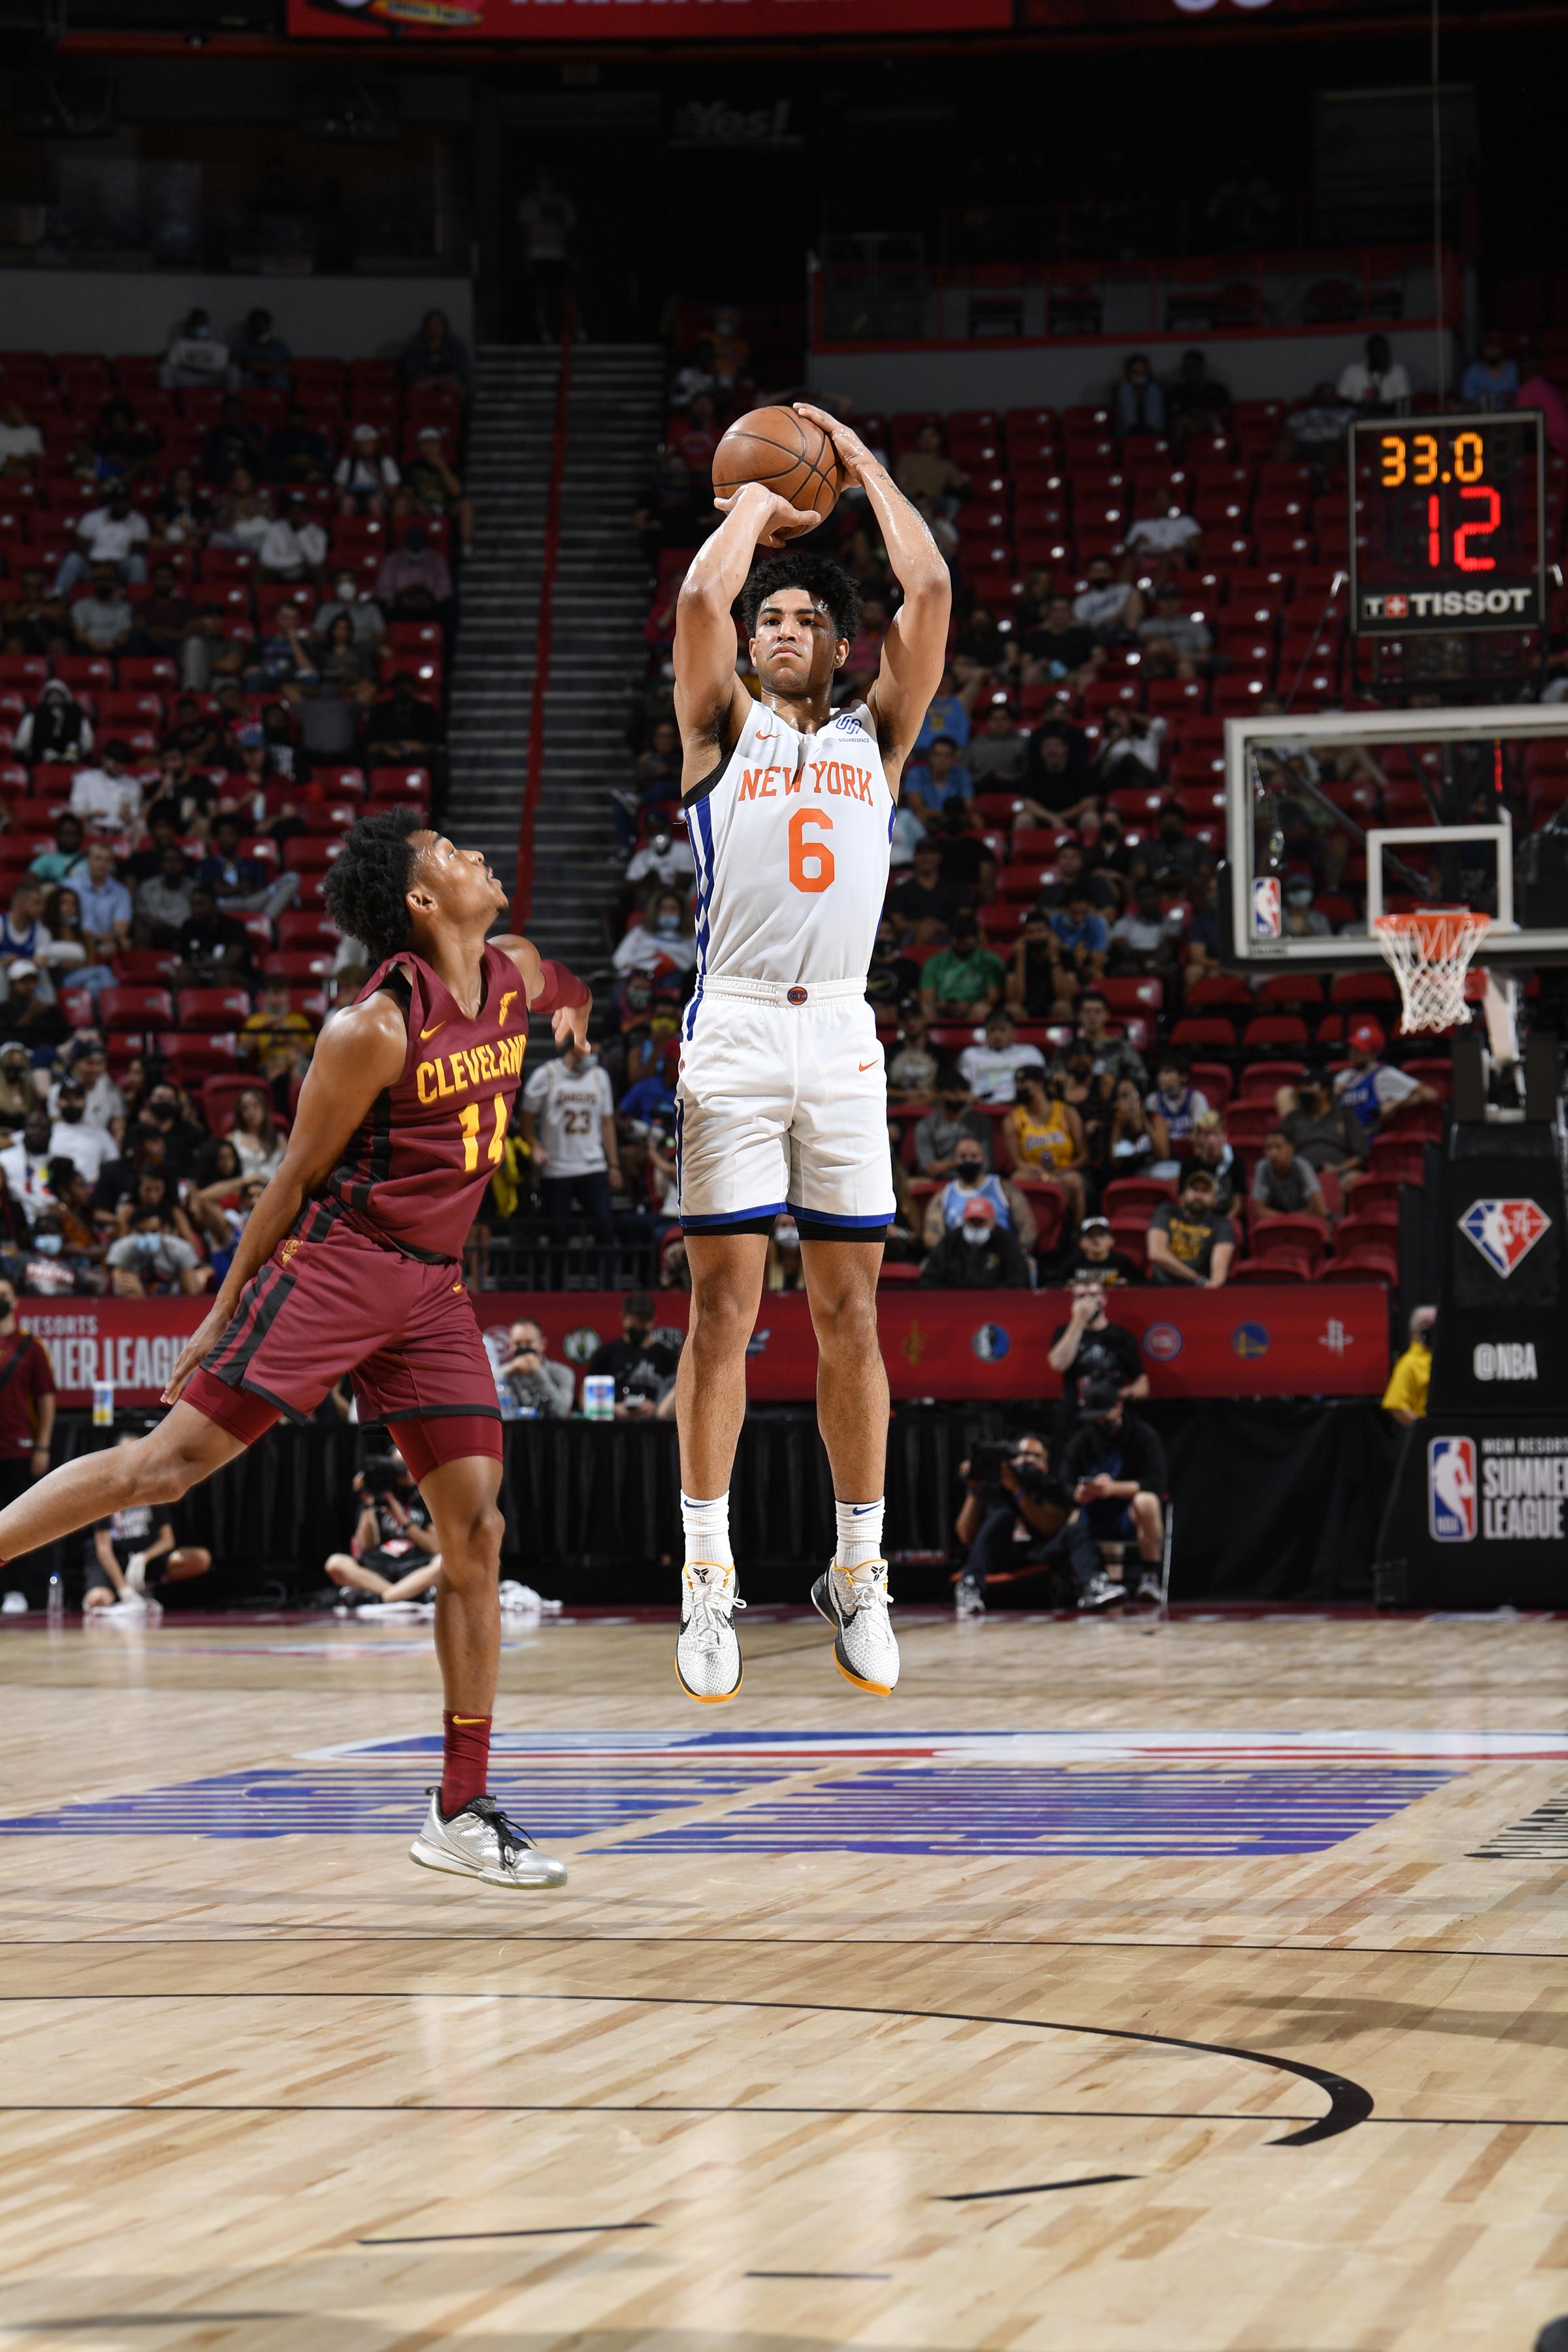 2021 Las Vegas Summer League - Cleveland Cavaliers v New York Knicks